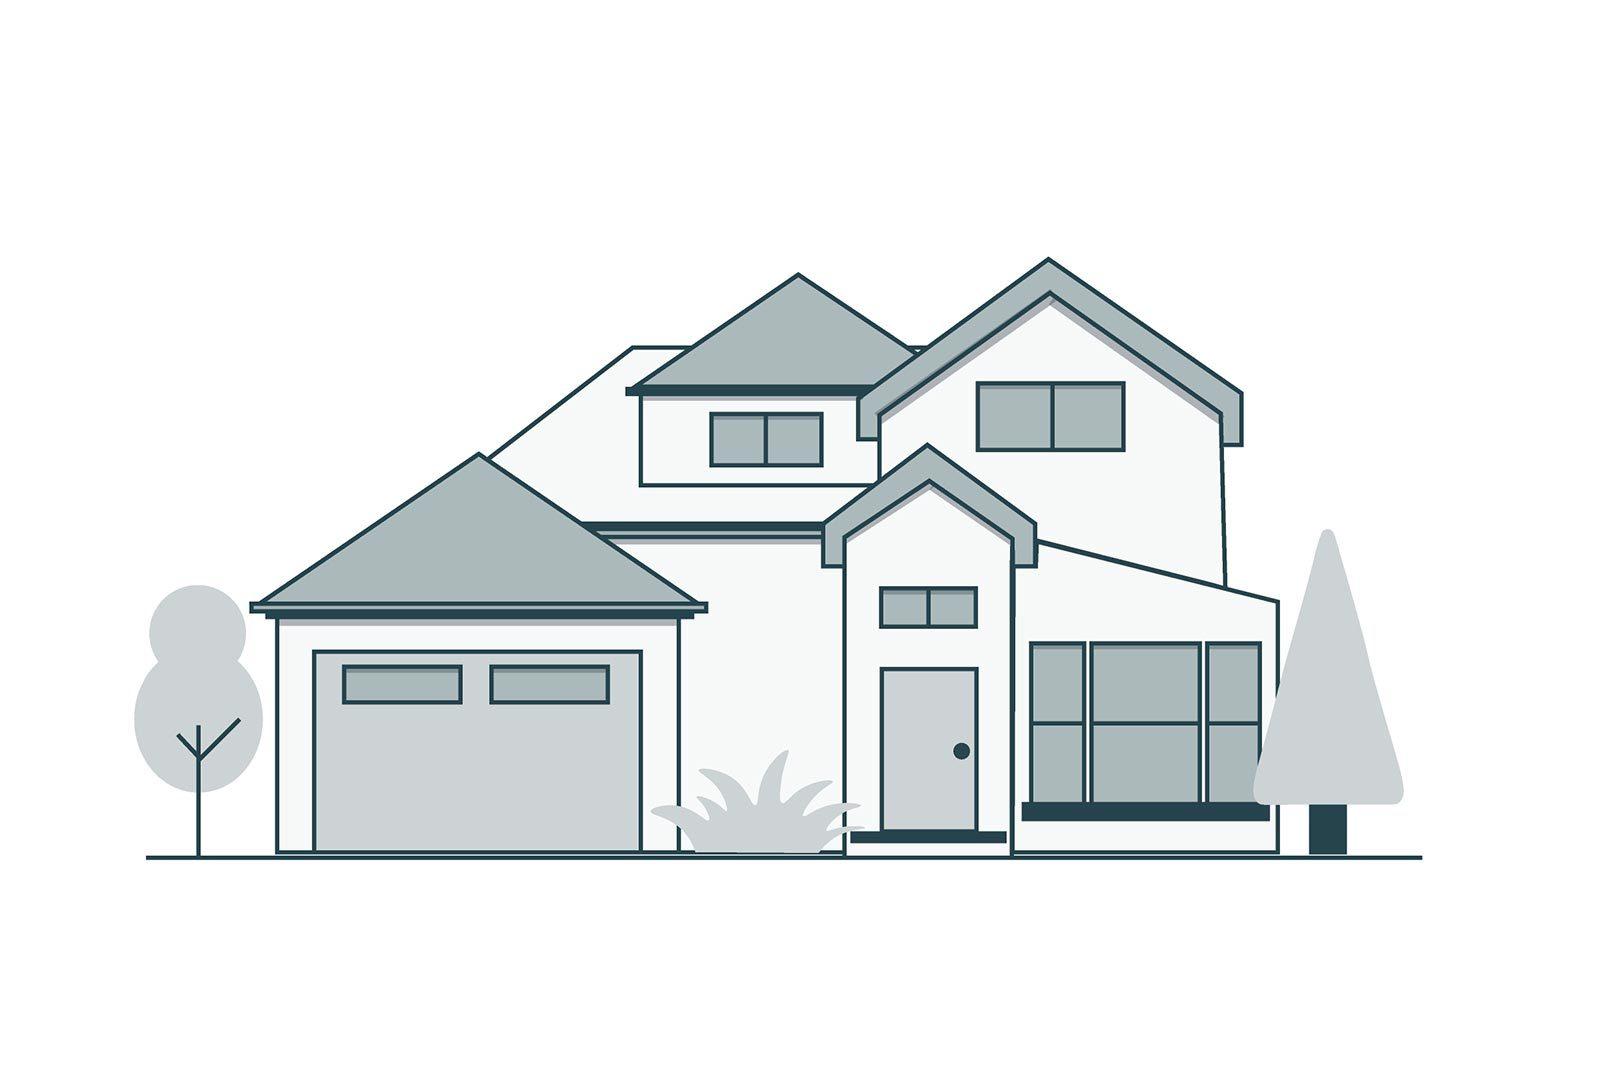 53 Wilder Street Unit 403 San Francisco, CA 94131